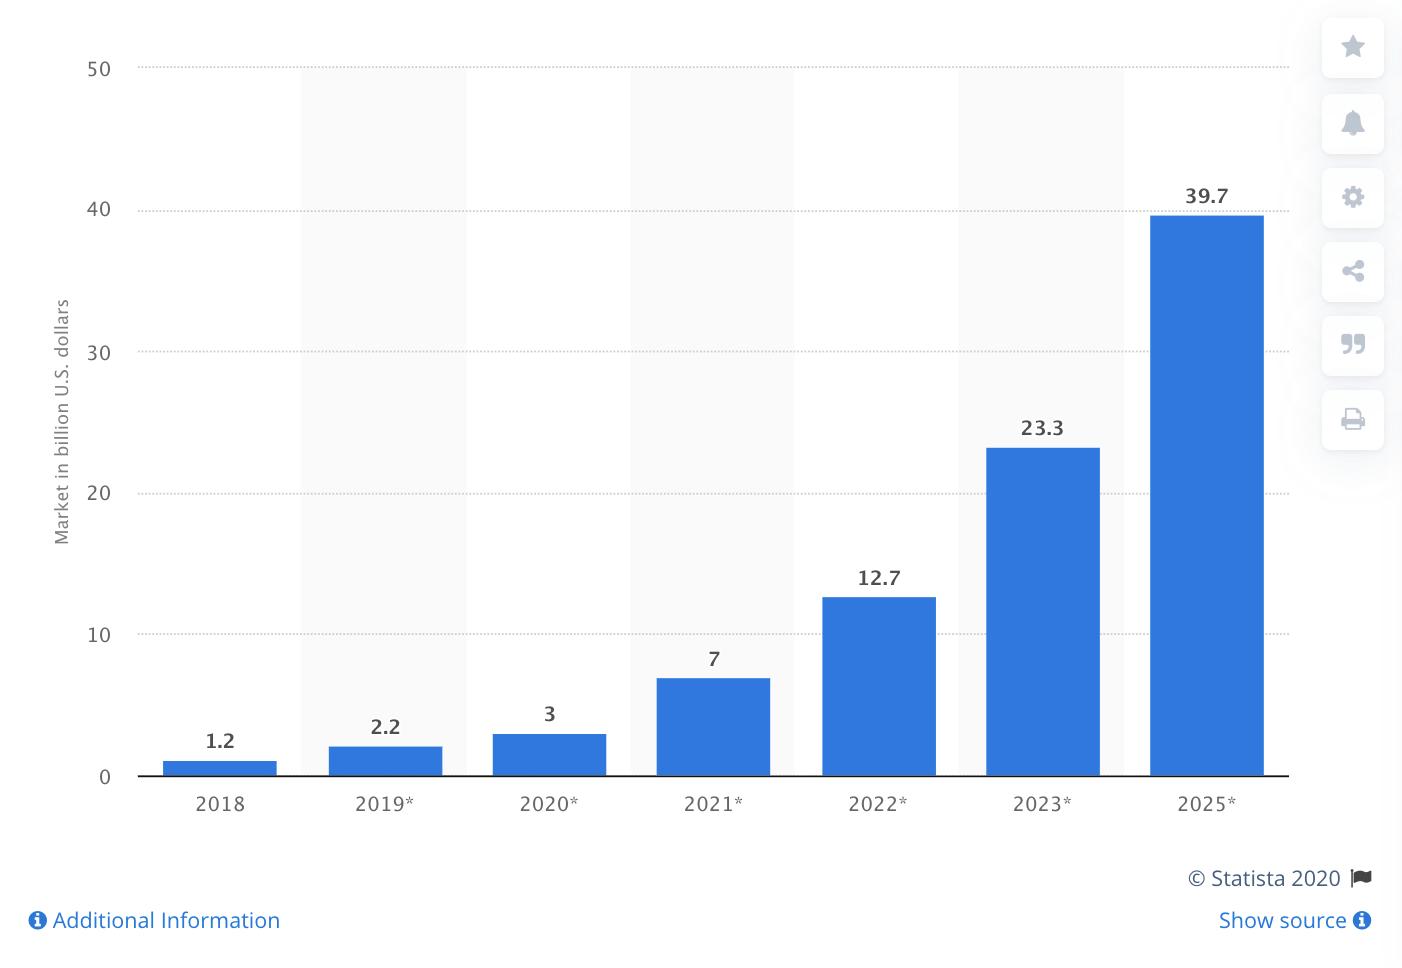 Size of the blockchain market